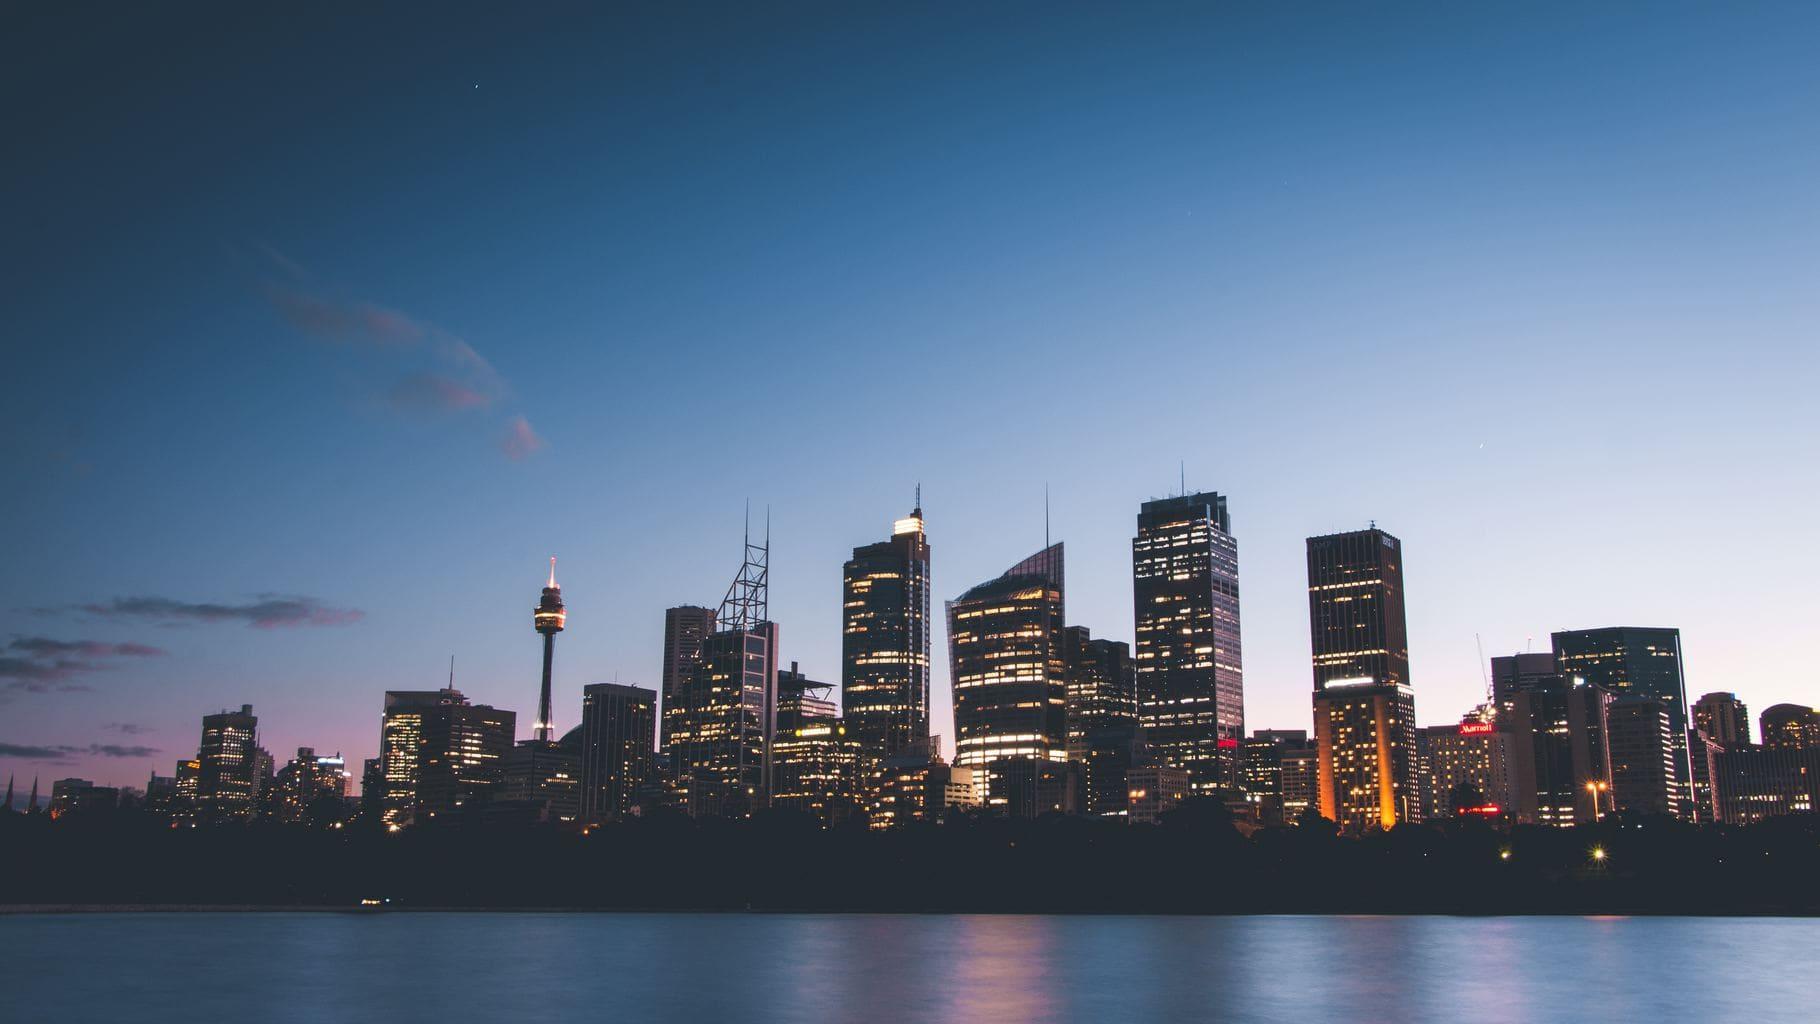 fotografía nocturna Skyline